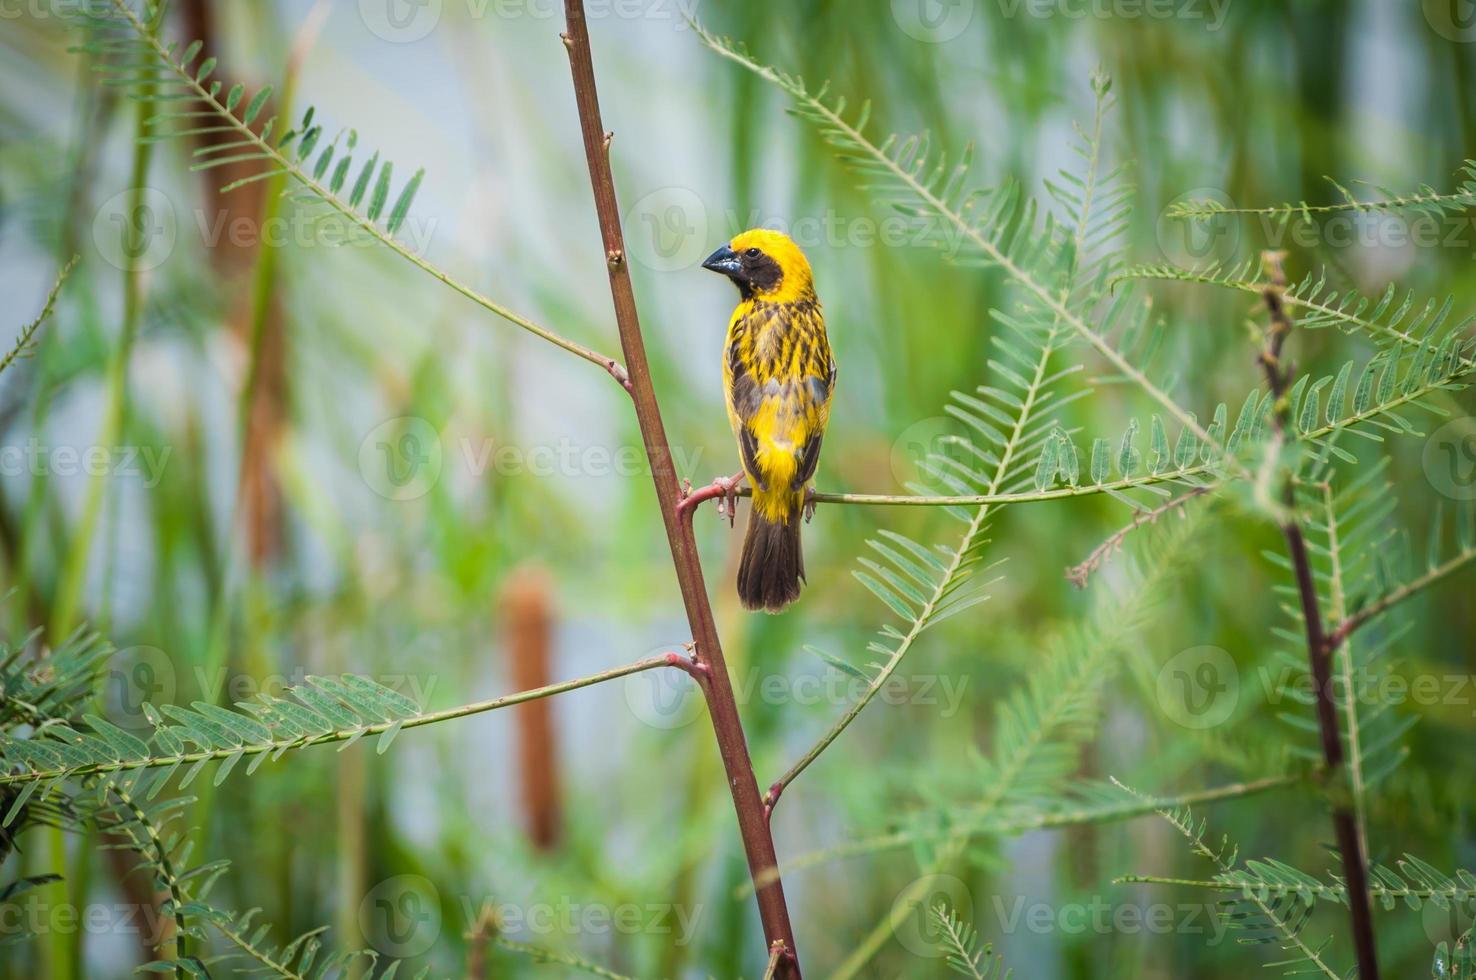 asiatisk gyllene vävare, manlig fågel foto